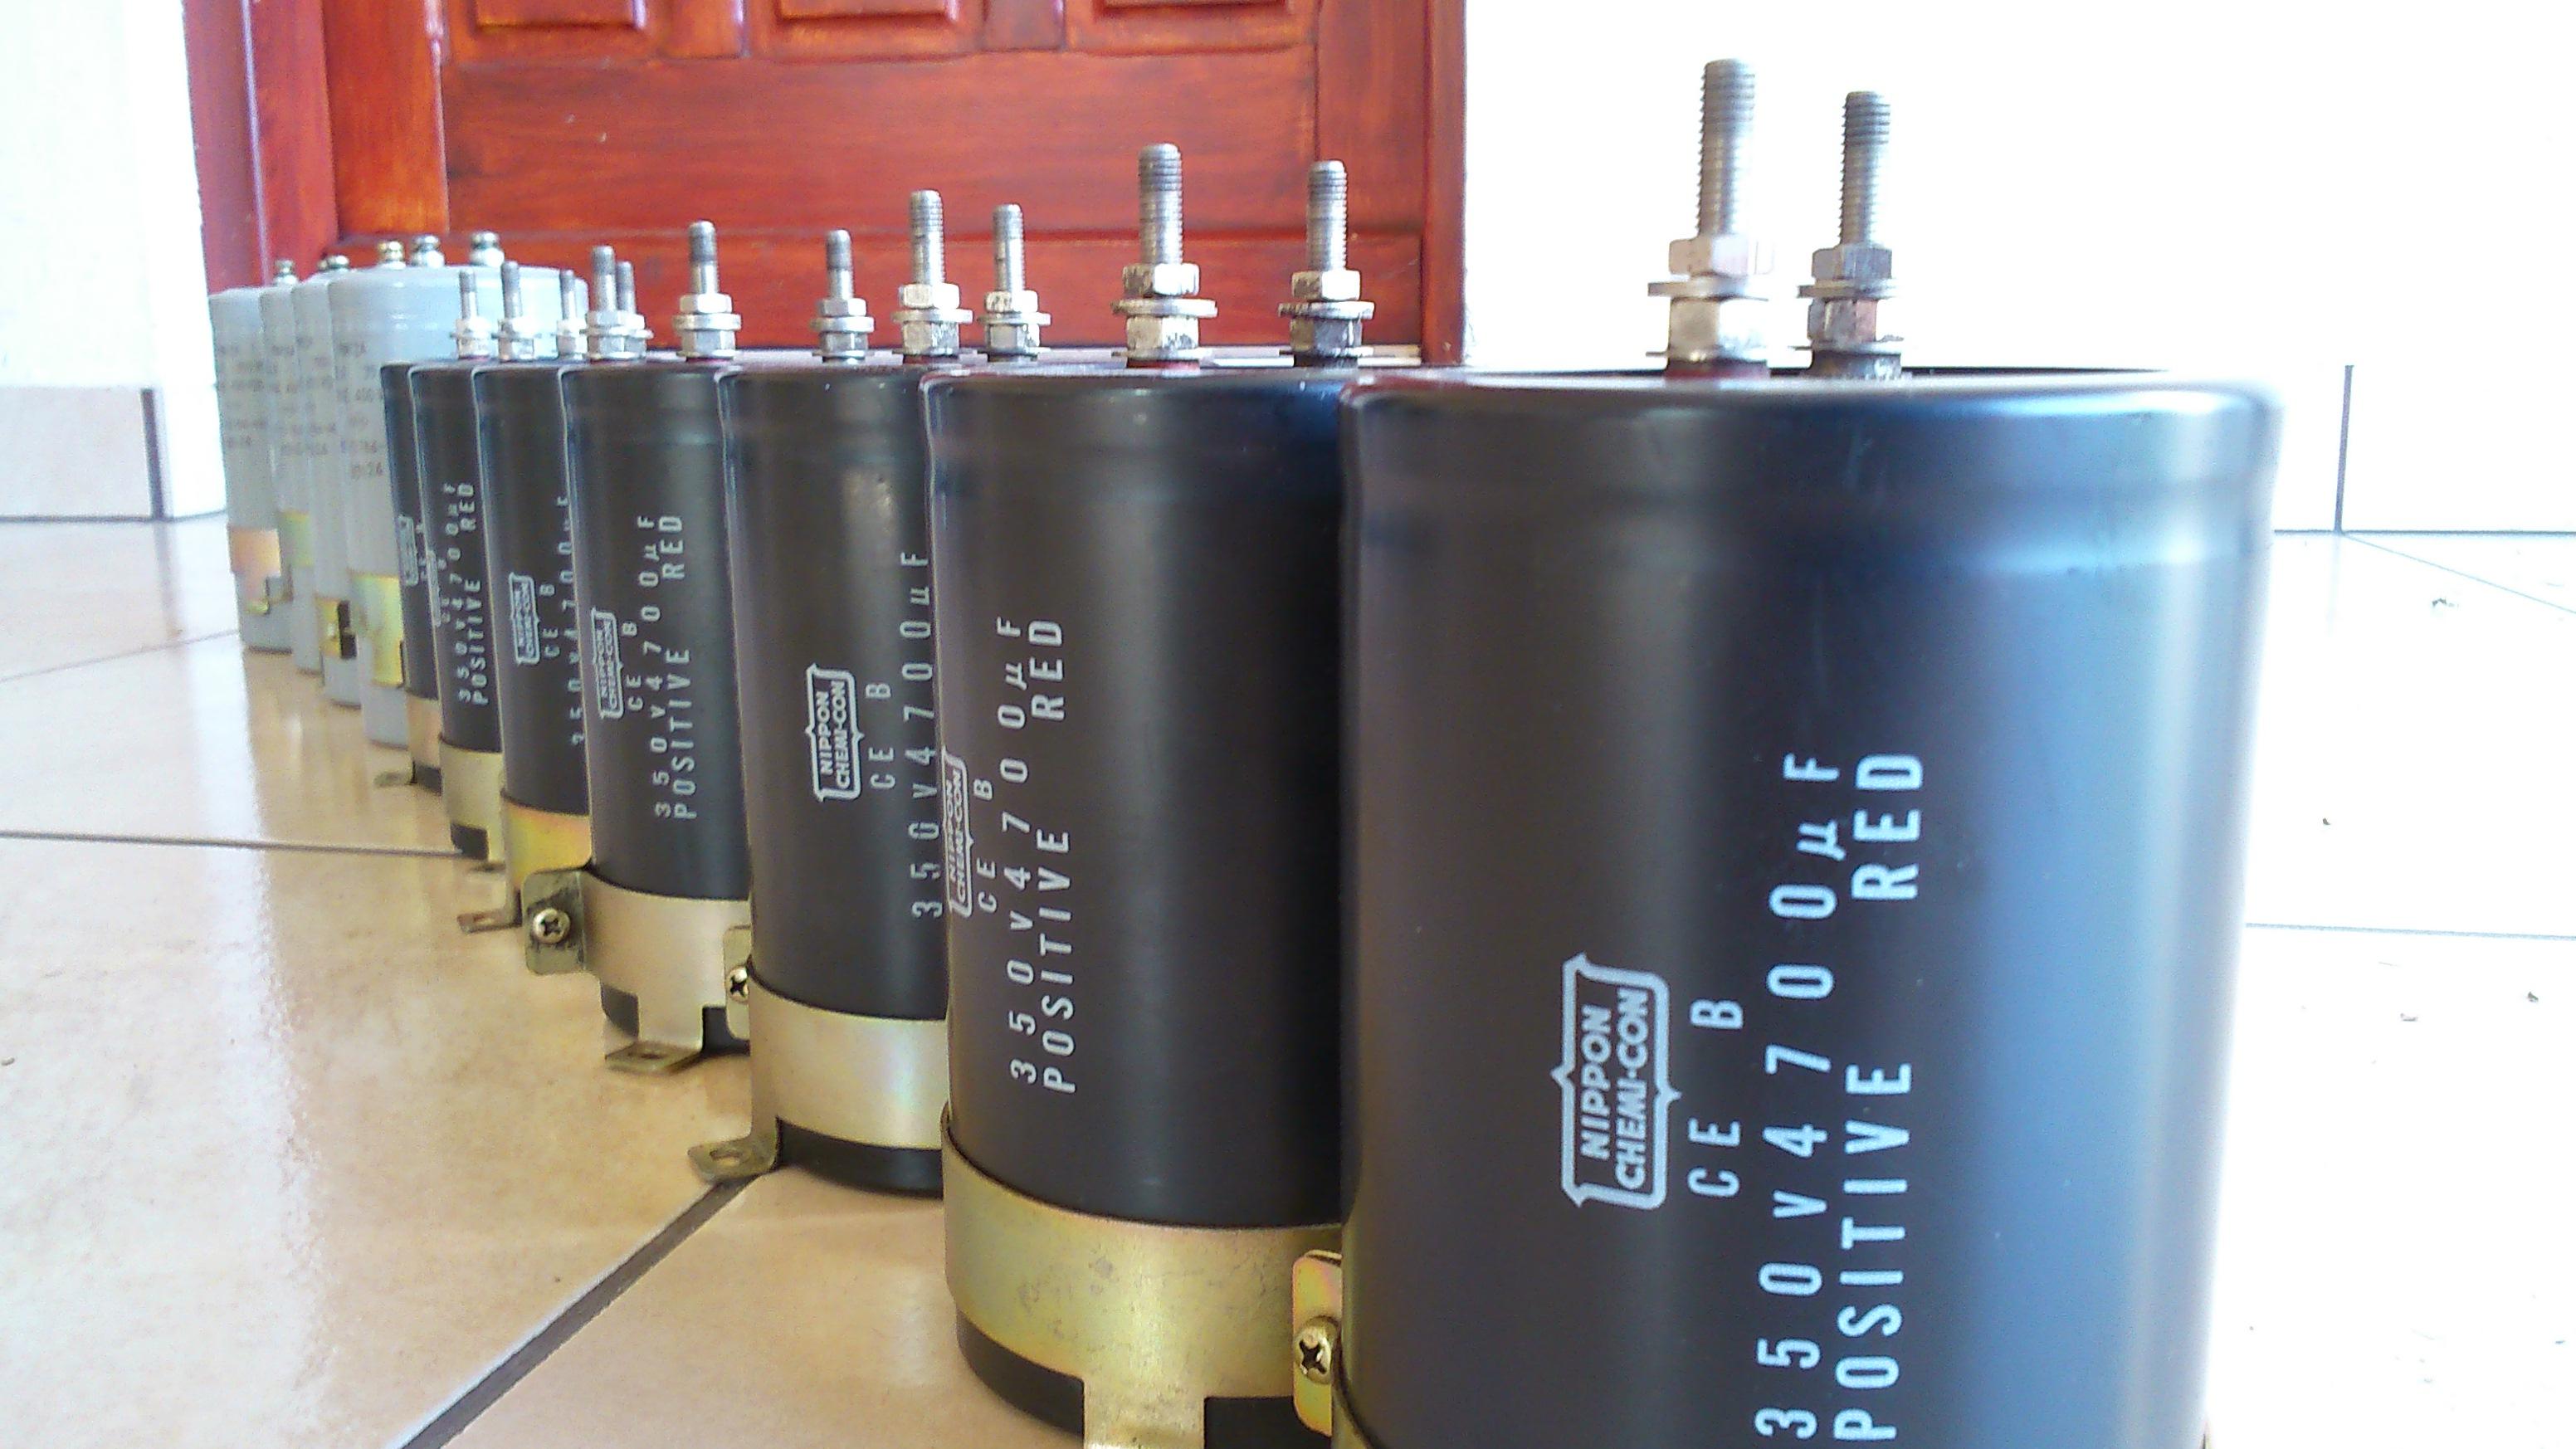 [Sprzedam] Kondensatory 4700uF/350V 12 sztuk